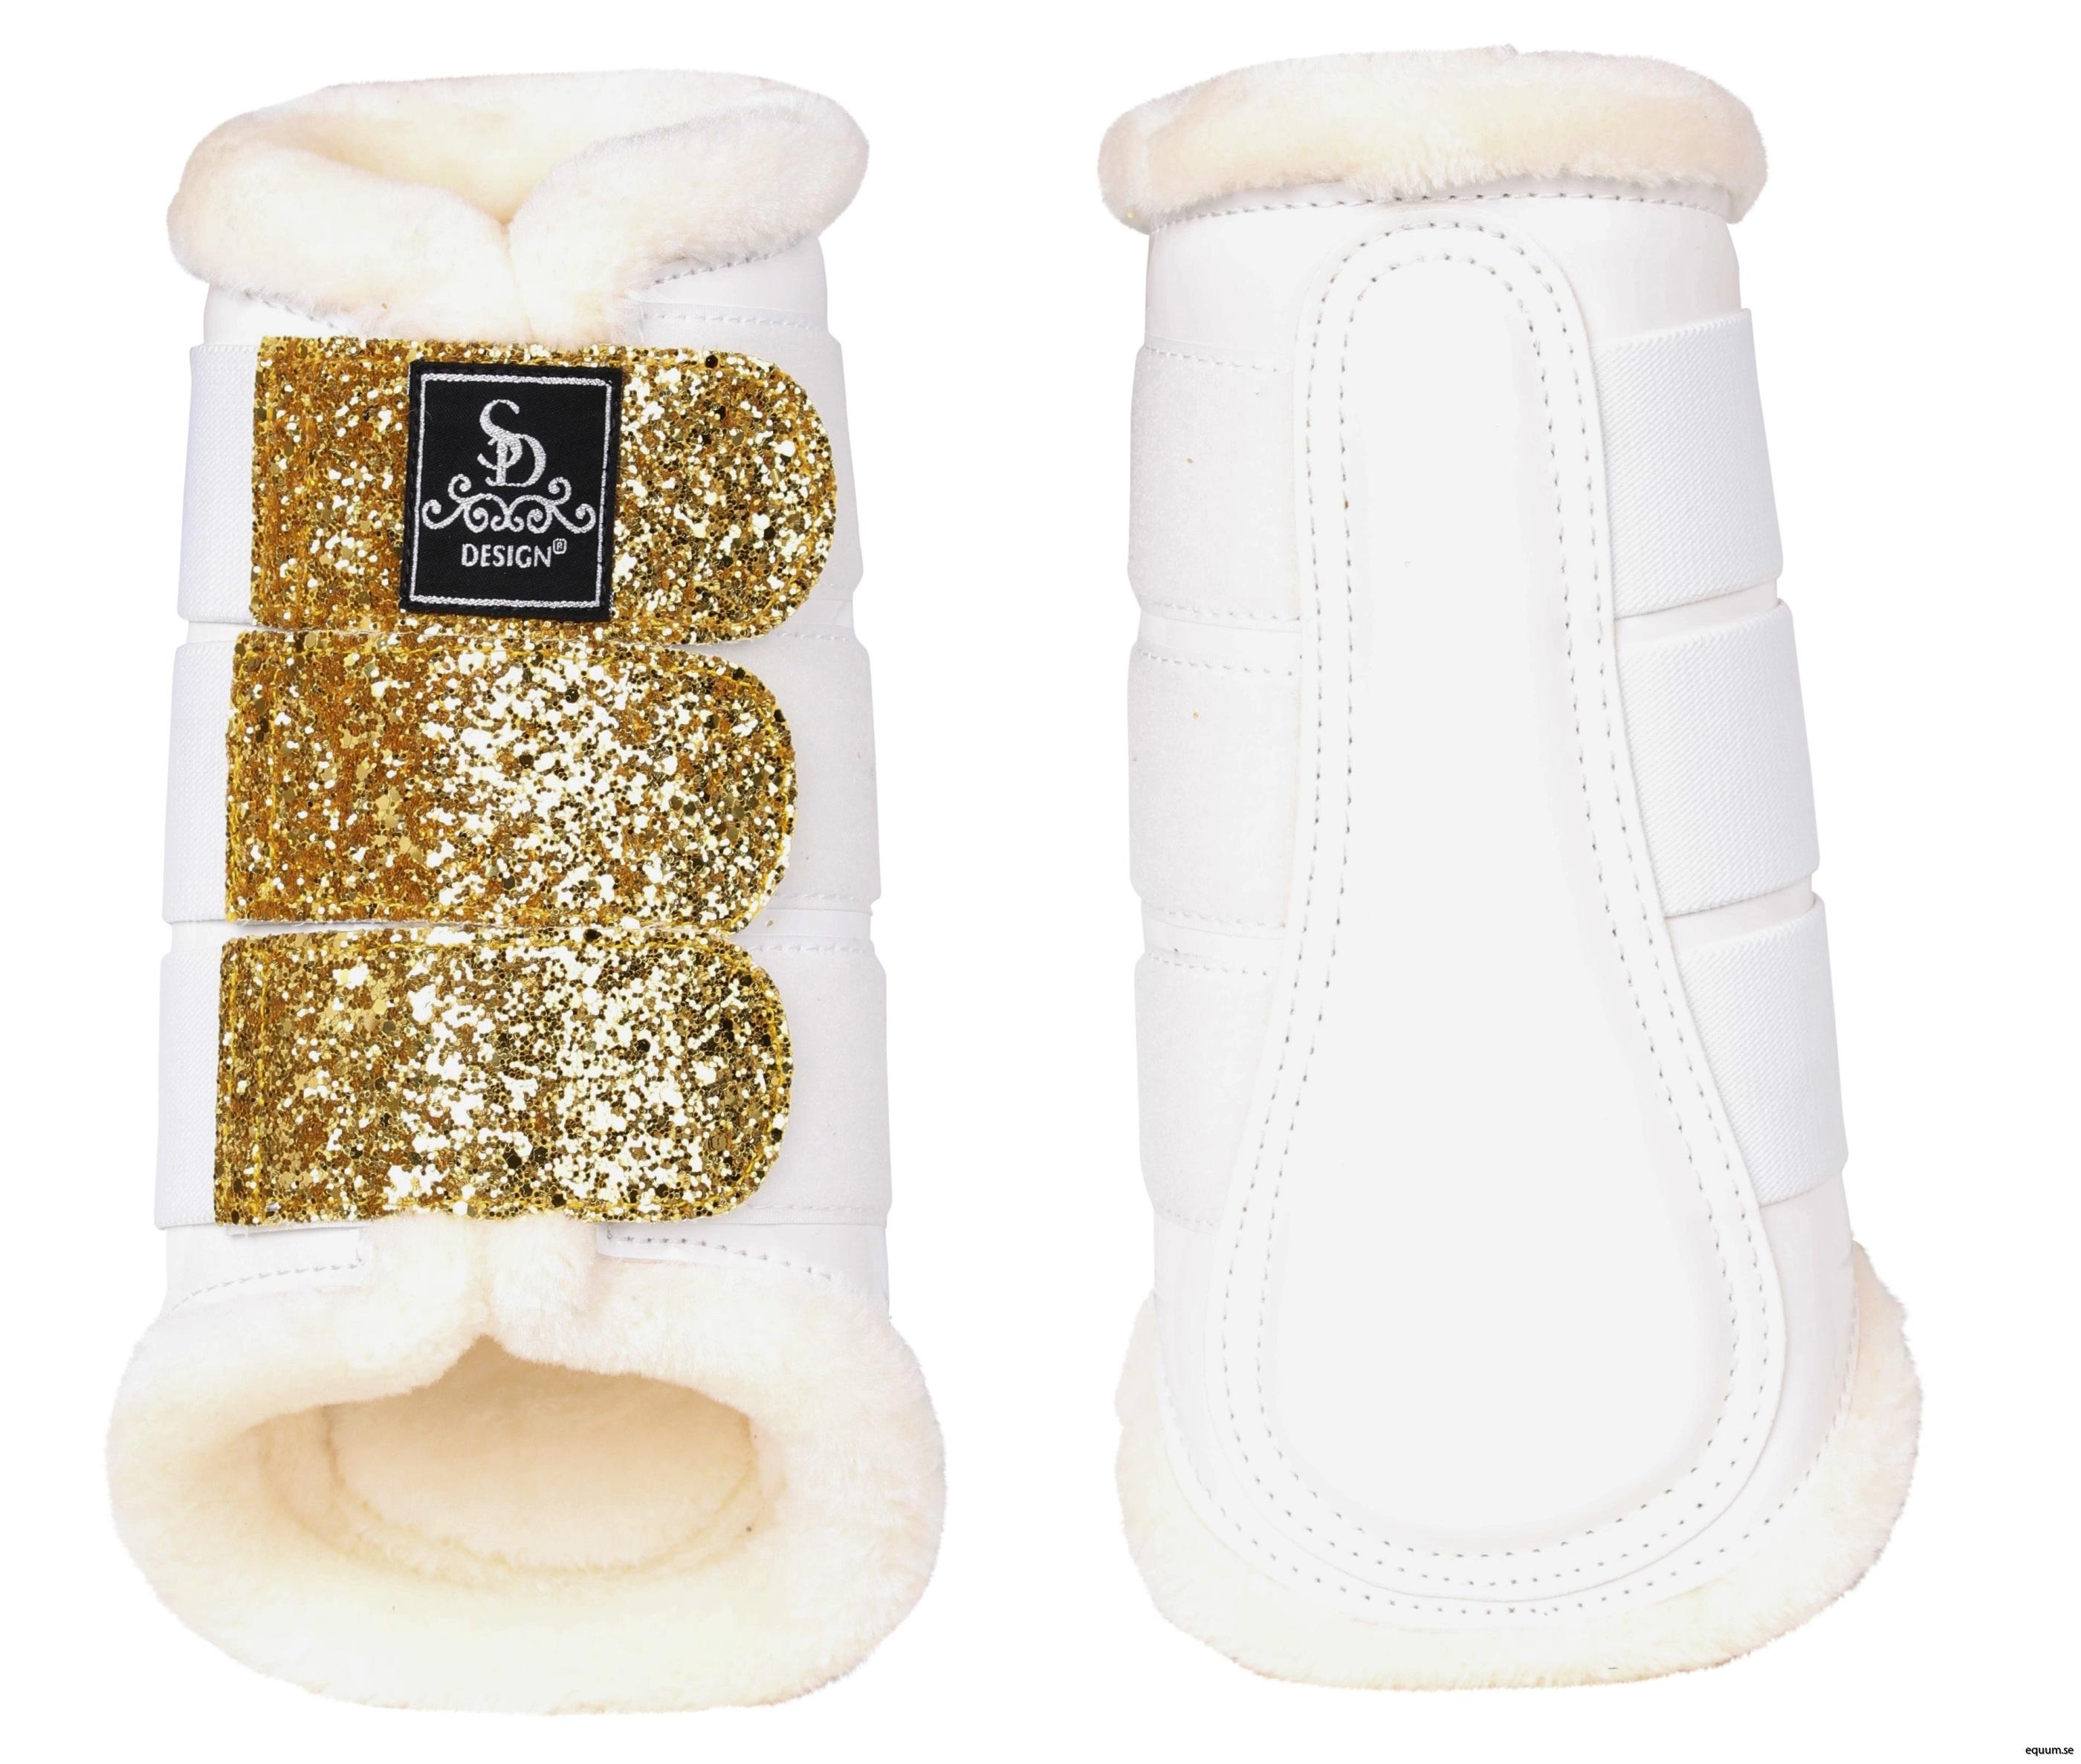 O-238-SD-gold-glitter-boots